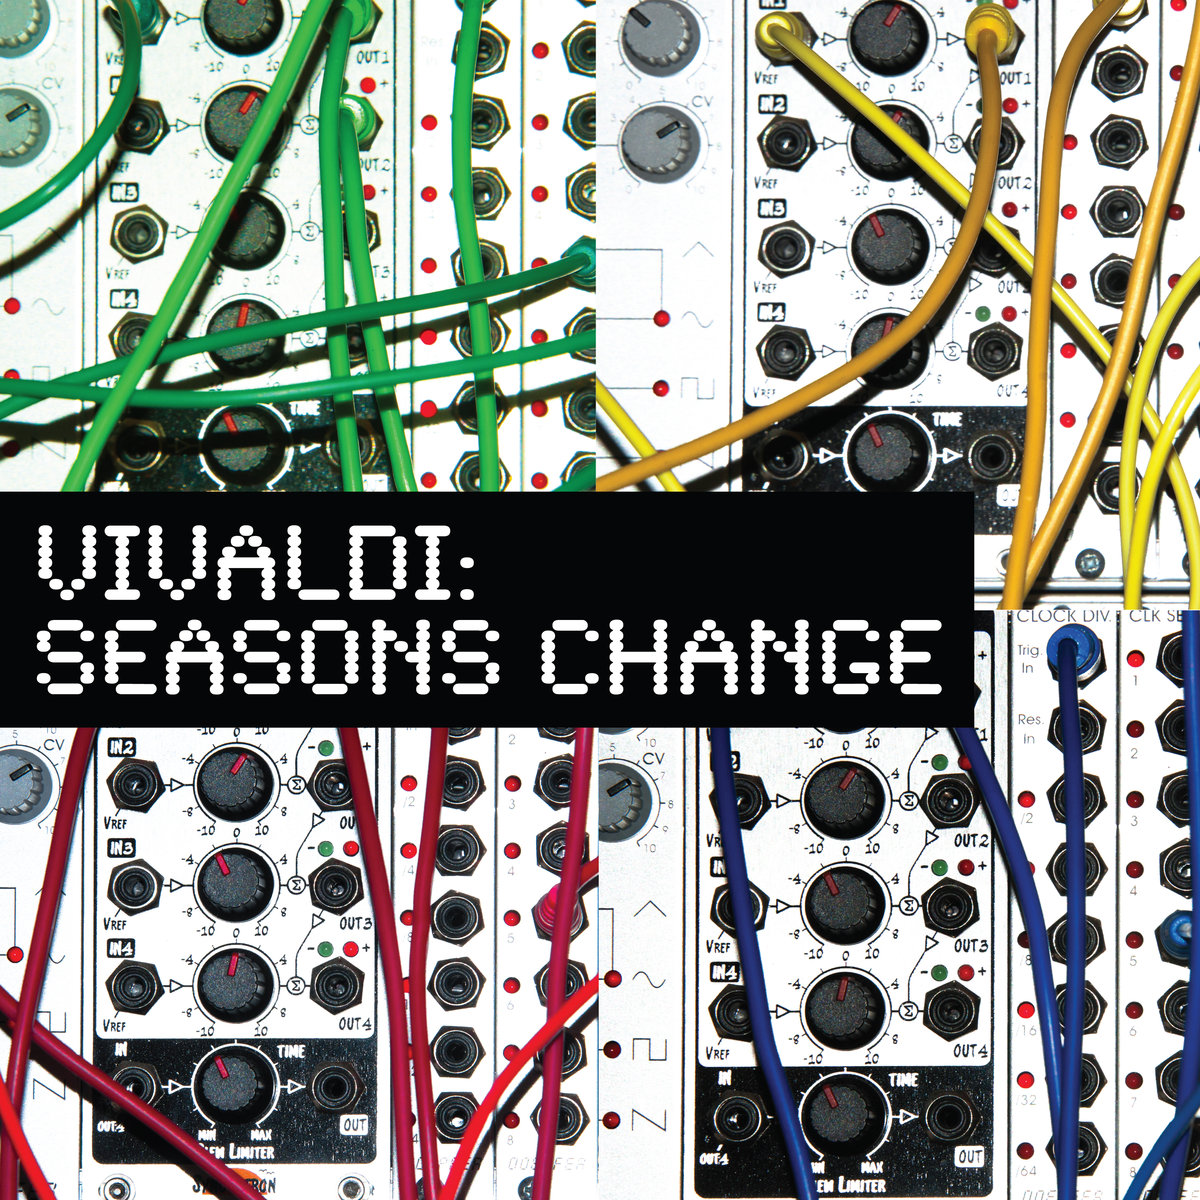 Willie Gibson - Vivaldi: Seasons Change